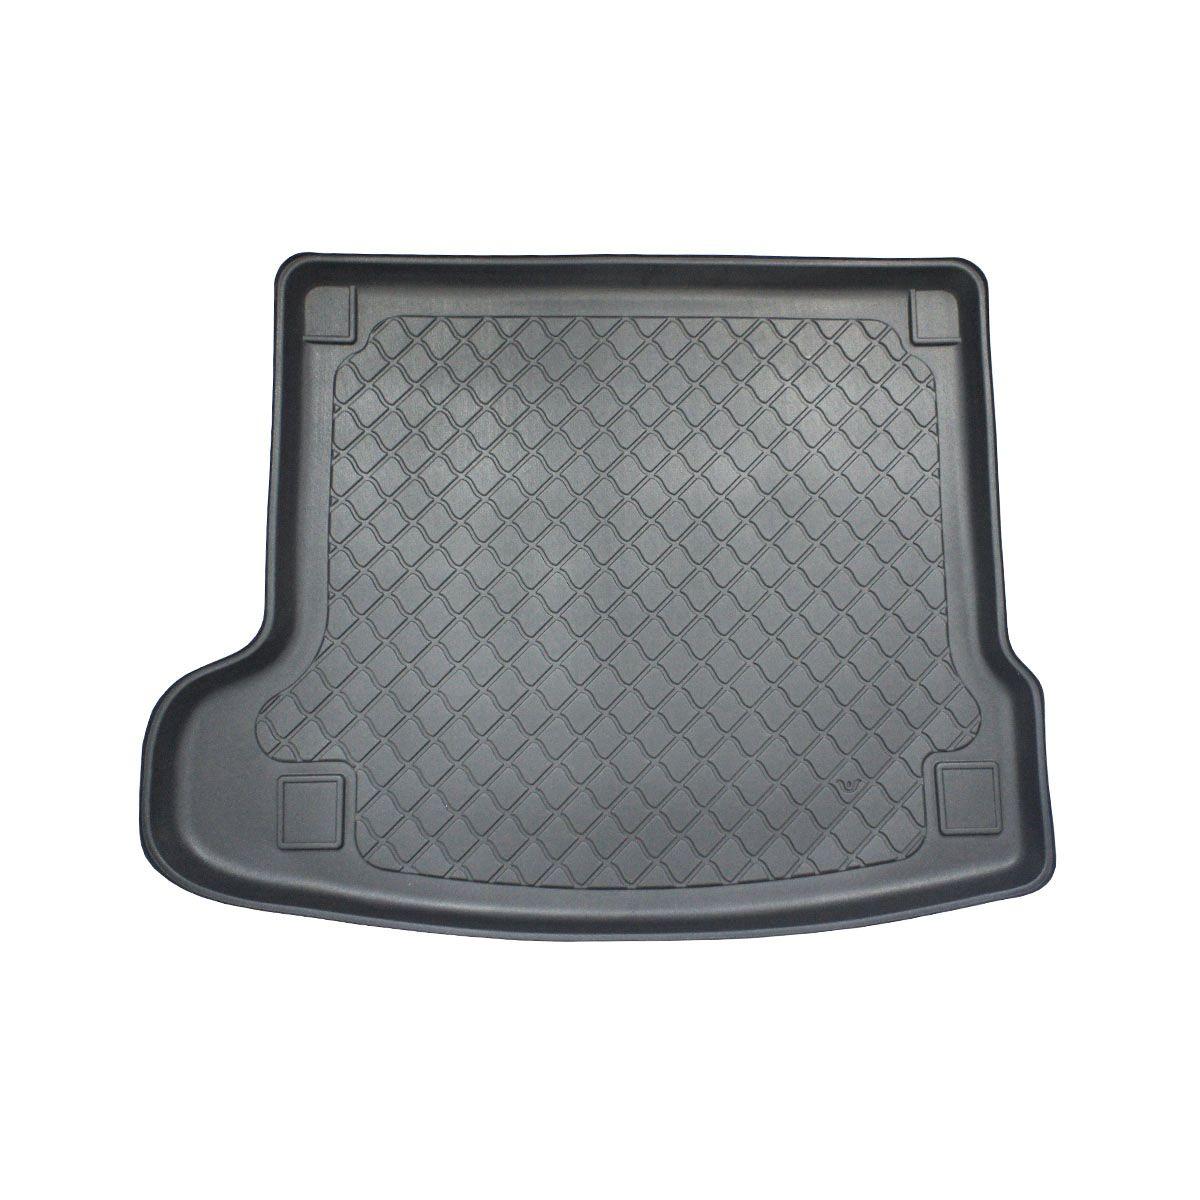 Land Rover Range Rover Velar (2017 onwards) Moulded Boot Mat product image